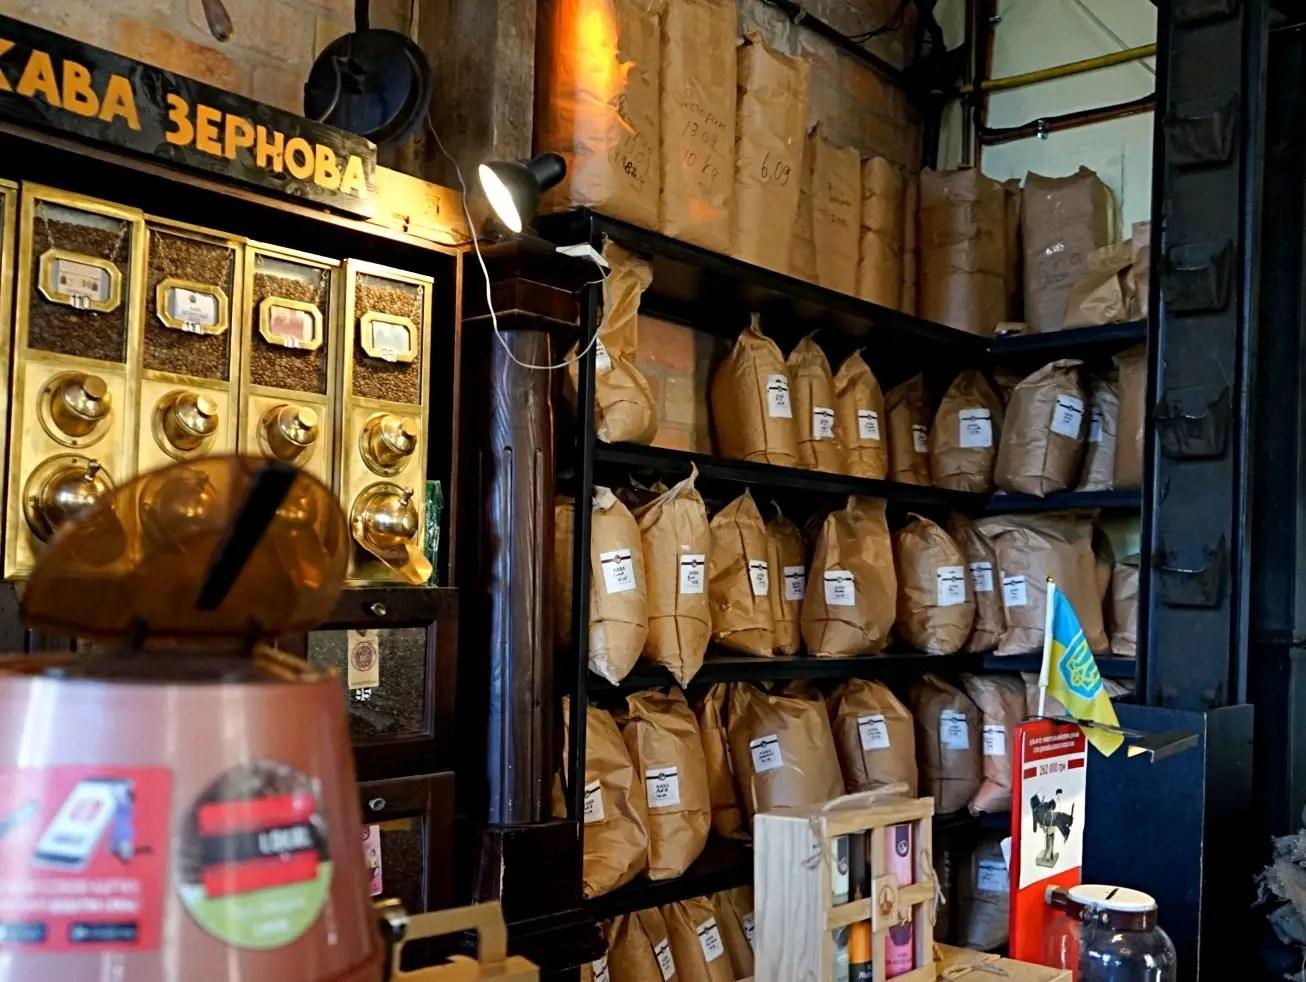 Coffee grinder at the coffee mine in Lviv